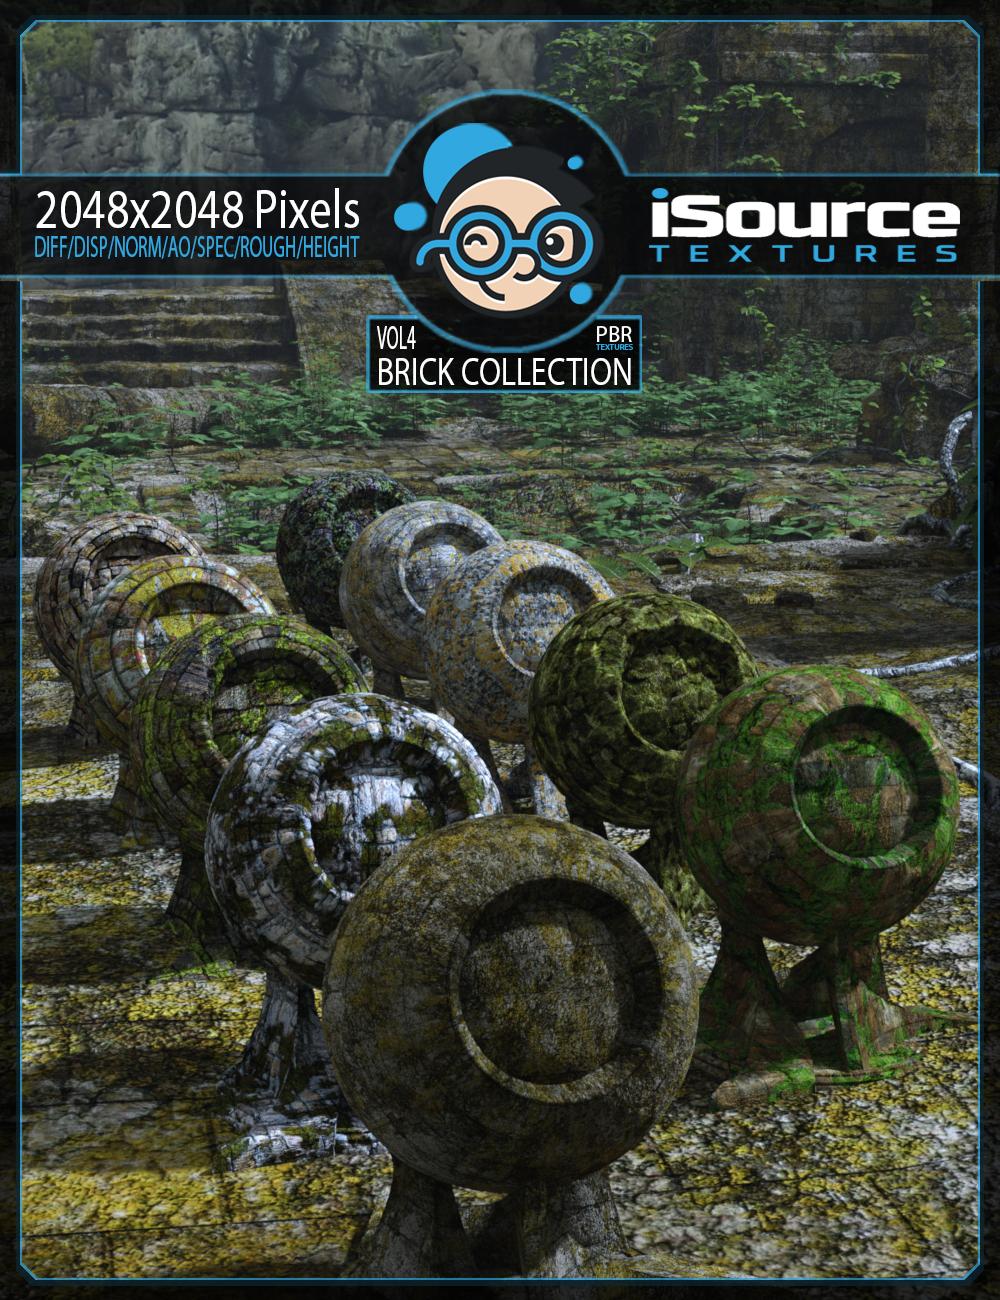 Brick Collection Merchant Resource - Vol4 (PBR Textures) by: iSourceTextures, 3D Models by Daz 3D